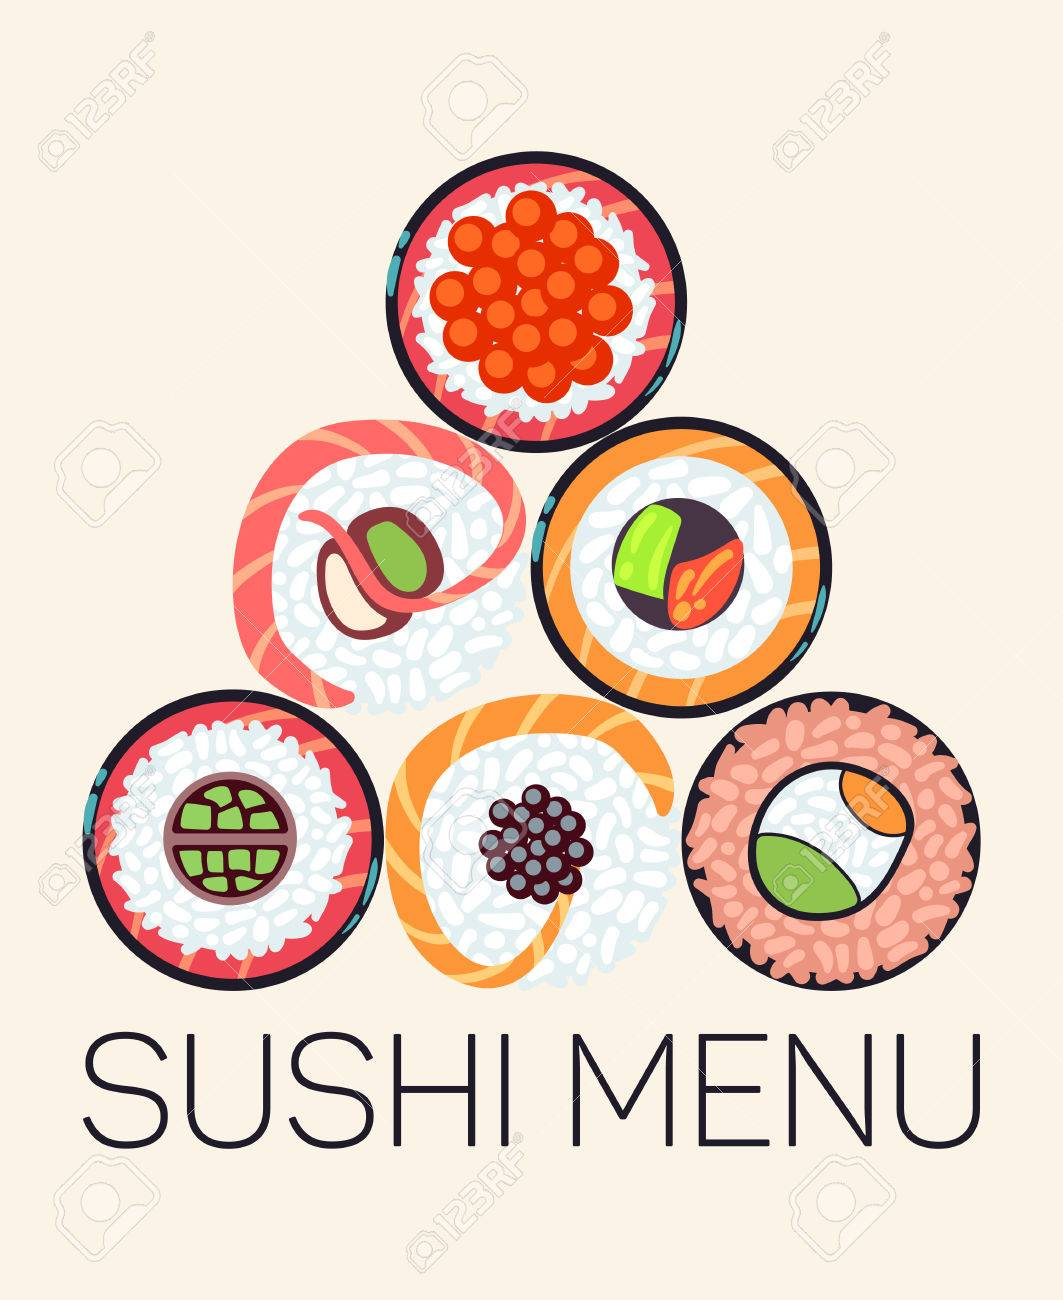 Japanese restaurant sushi menu template asian menu with roll japanese restaurant sushi menu template asian menu with roll vector illustration stock vector pronofoot35fo Gallery